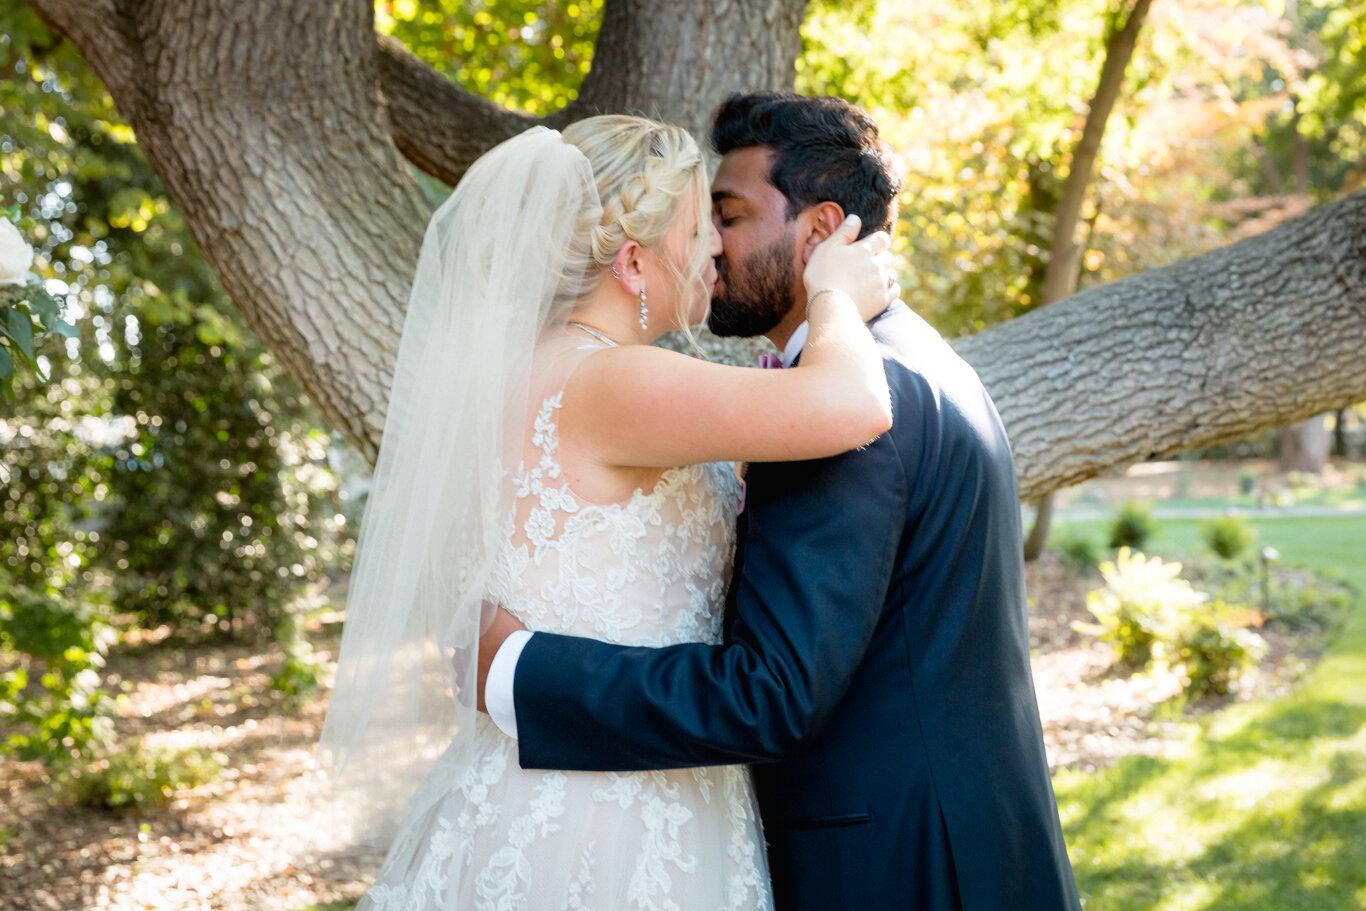 2019.08.24_Emily-Ashir-Wedding-at-the-Maples-5905.jpg